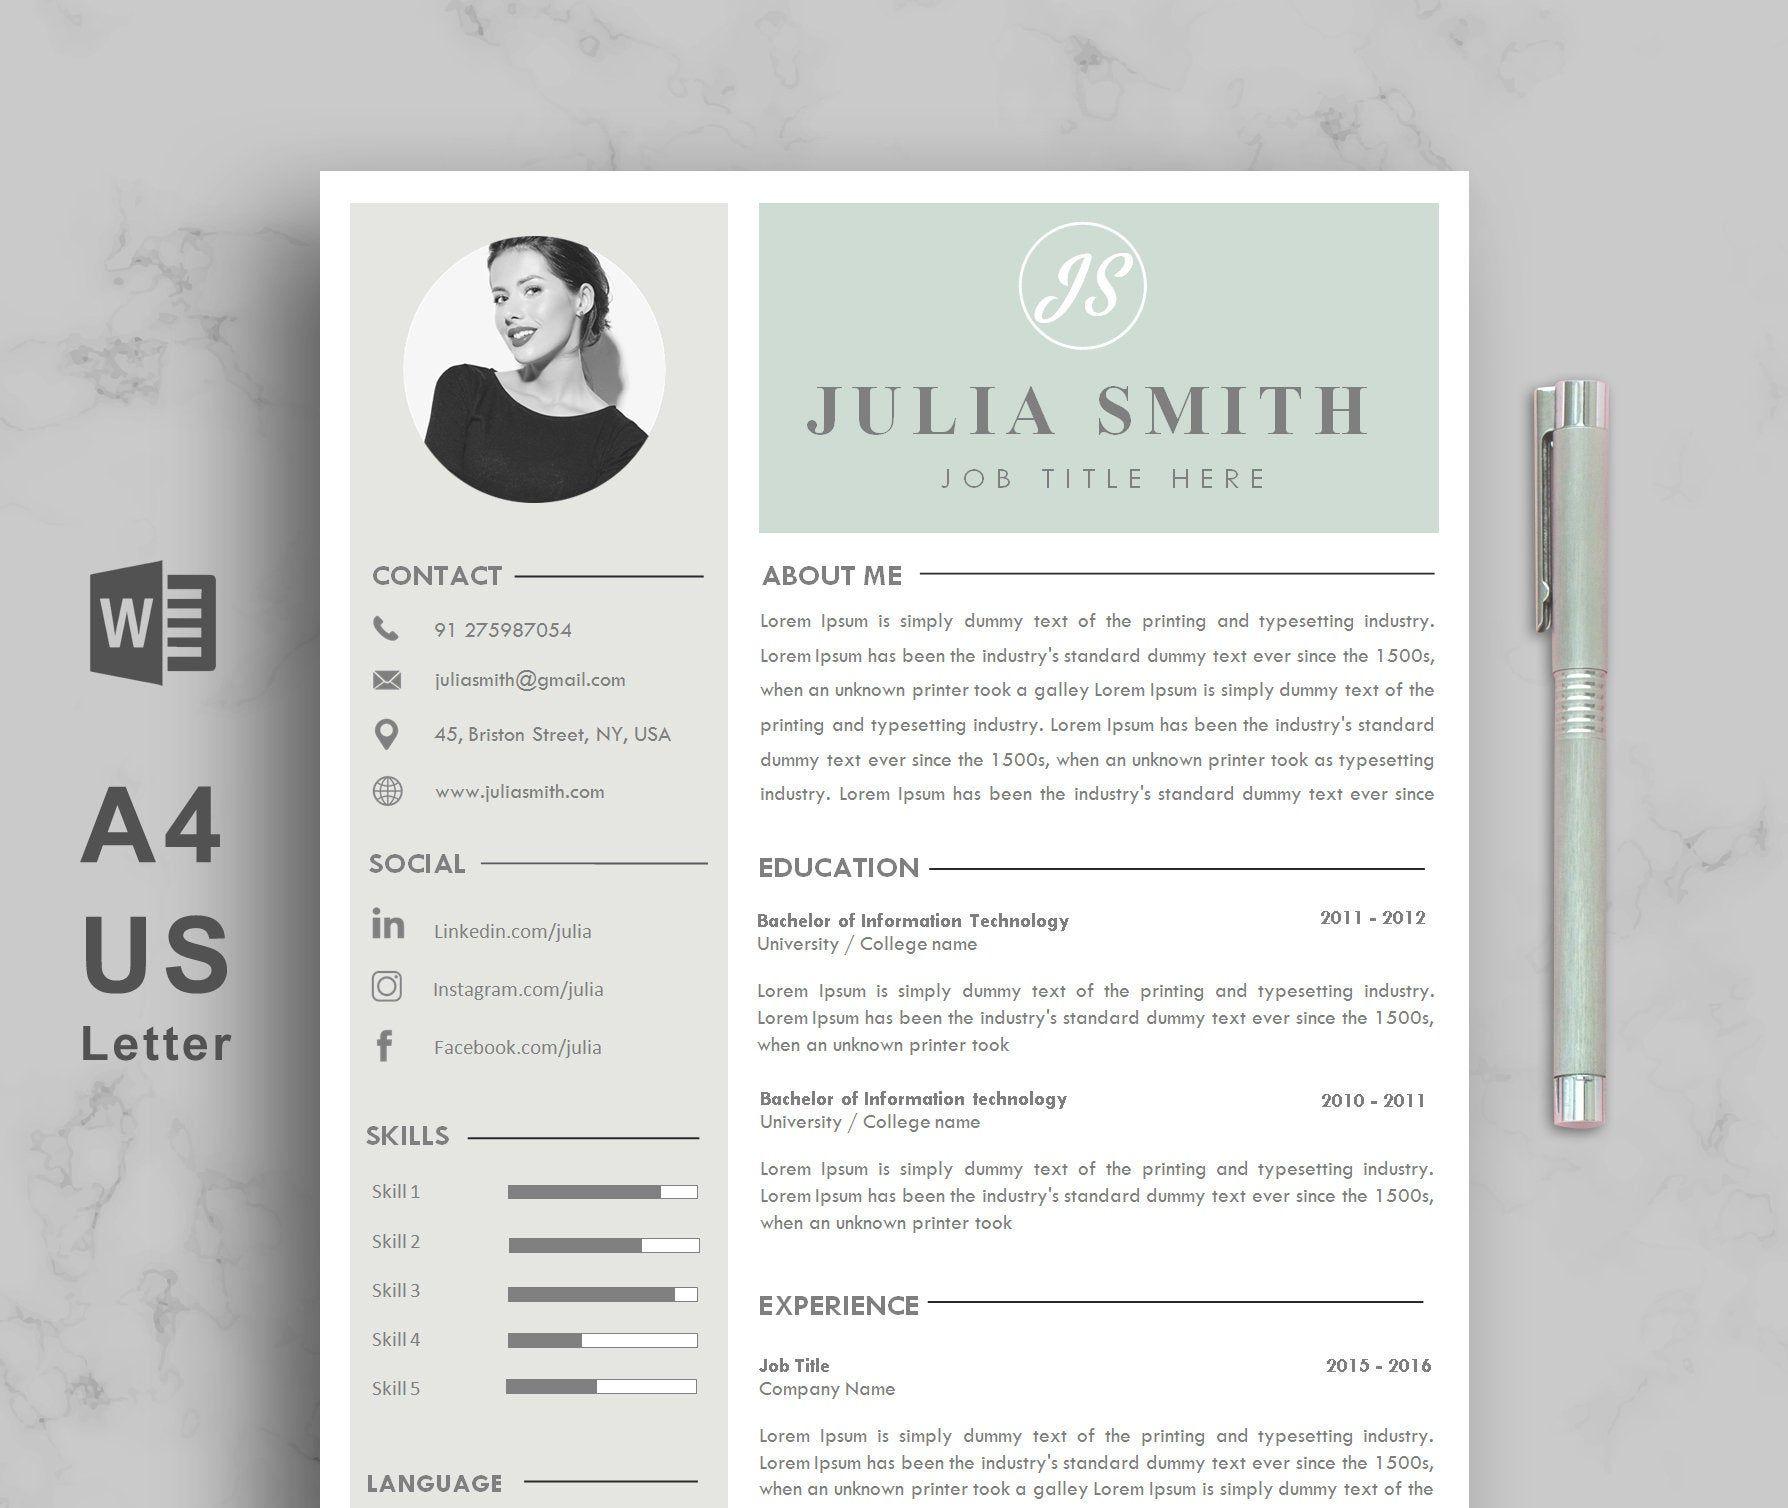 Resume Template, CV Template, Minimalist Resume, Resume